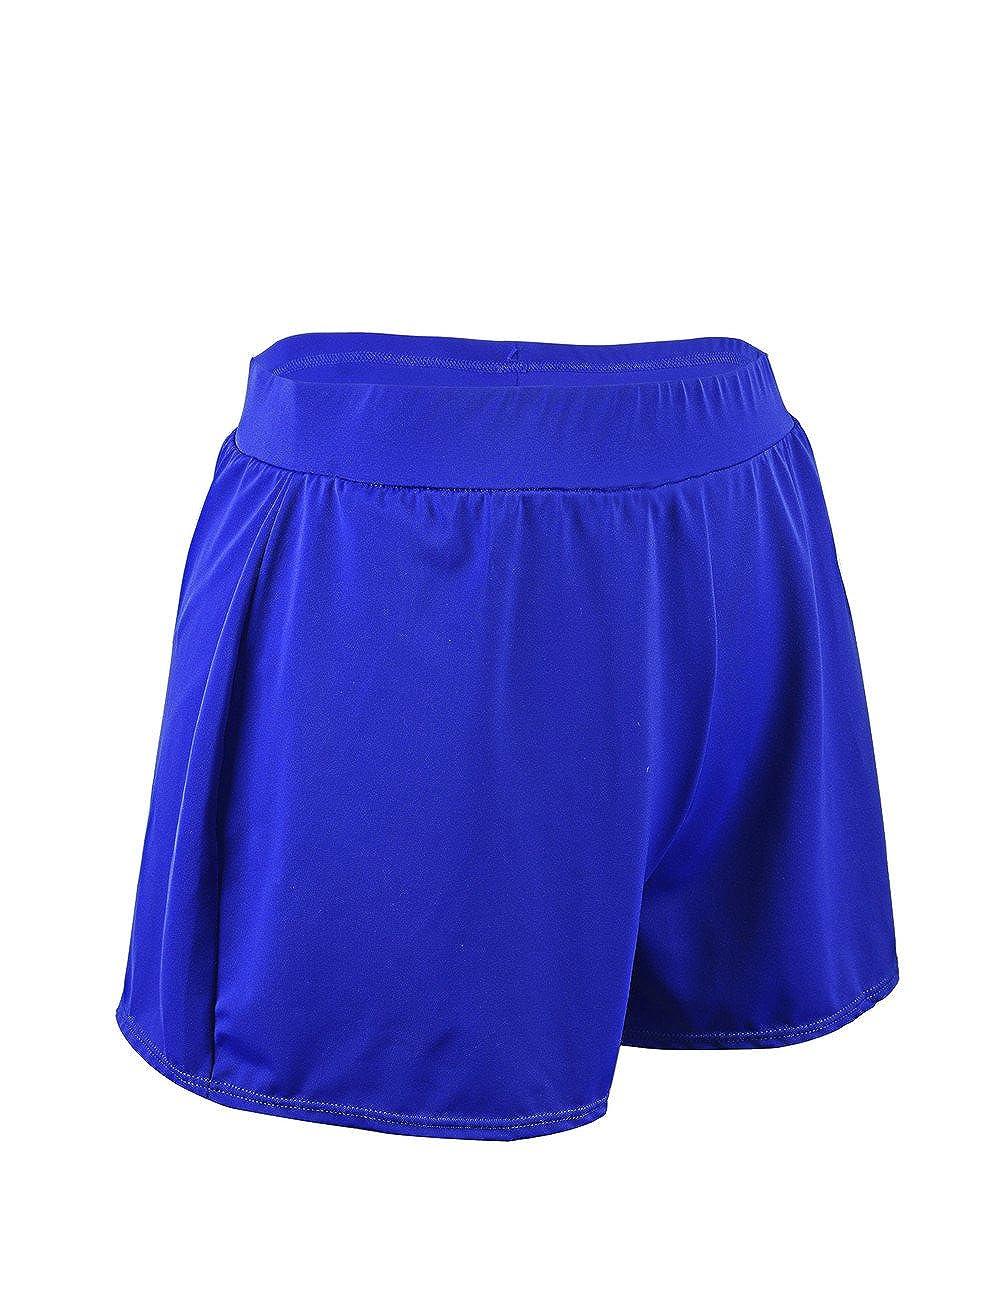 2592e96a1b6eb Sportbekleidung Rocorose Damen Einfarbig A-linien Bikini Hose Große Größen  mit Slip